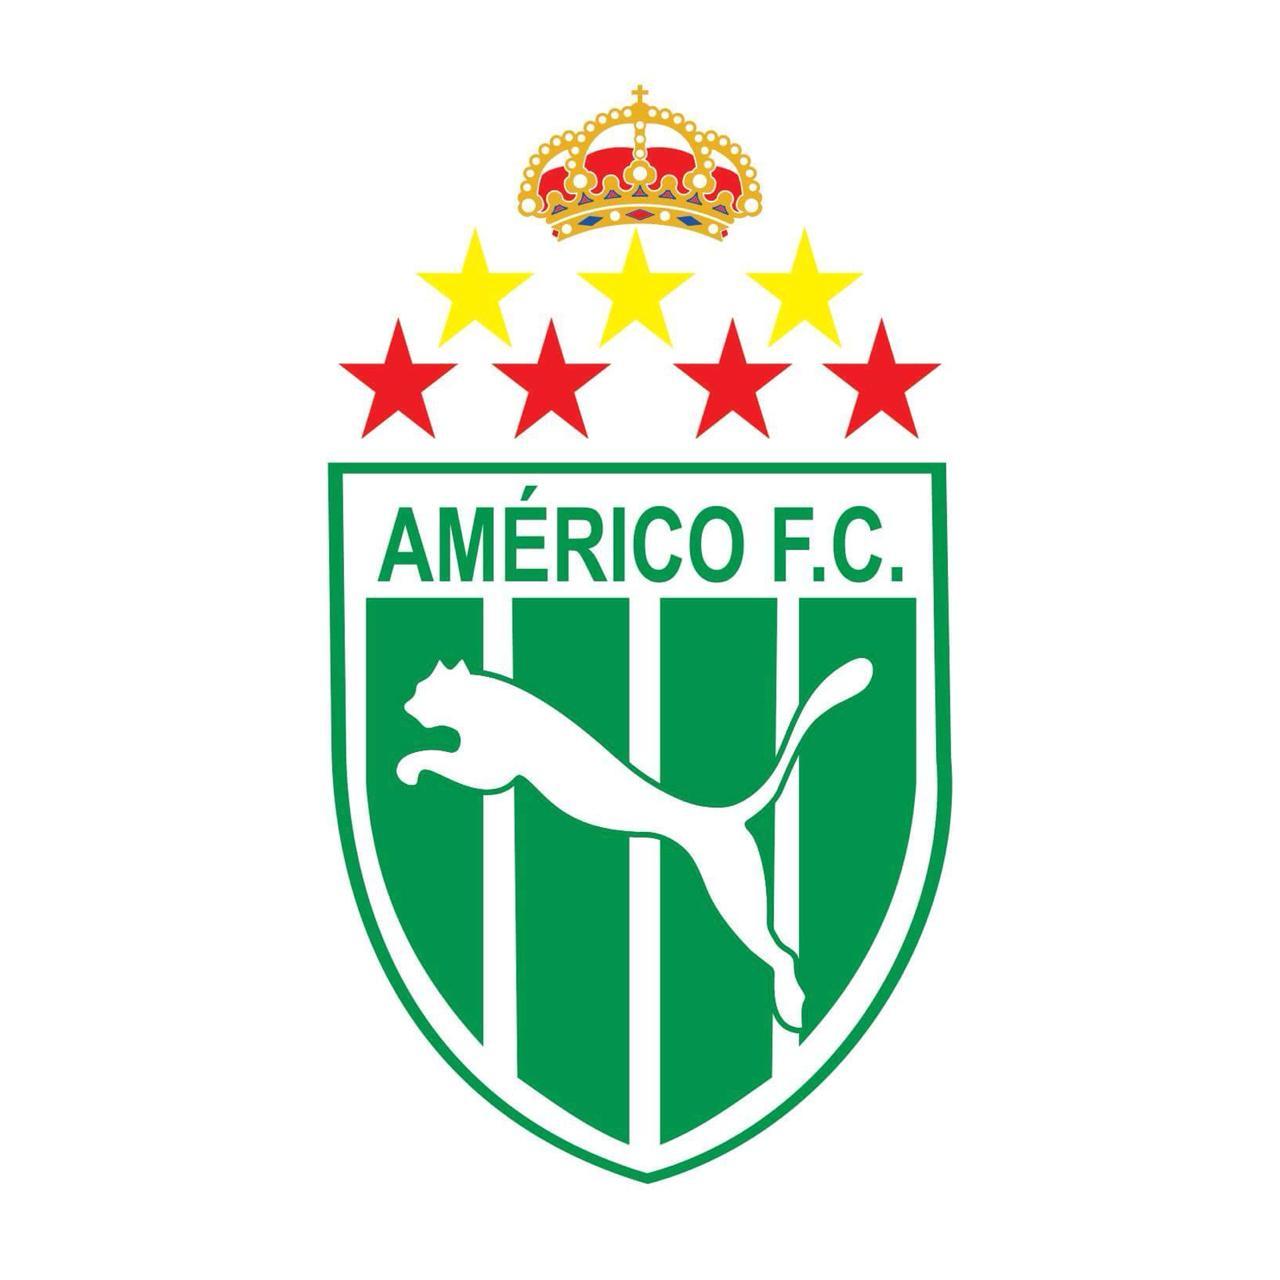 AMERICO FUTEBOL CLUBE